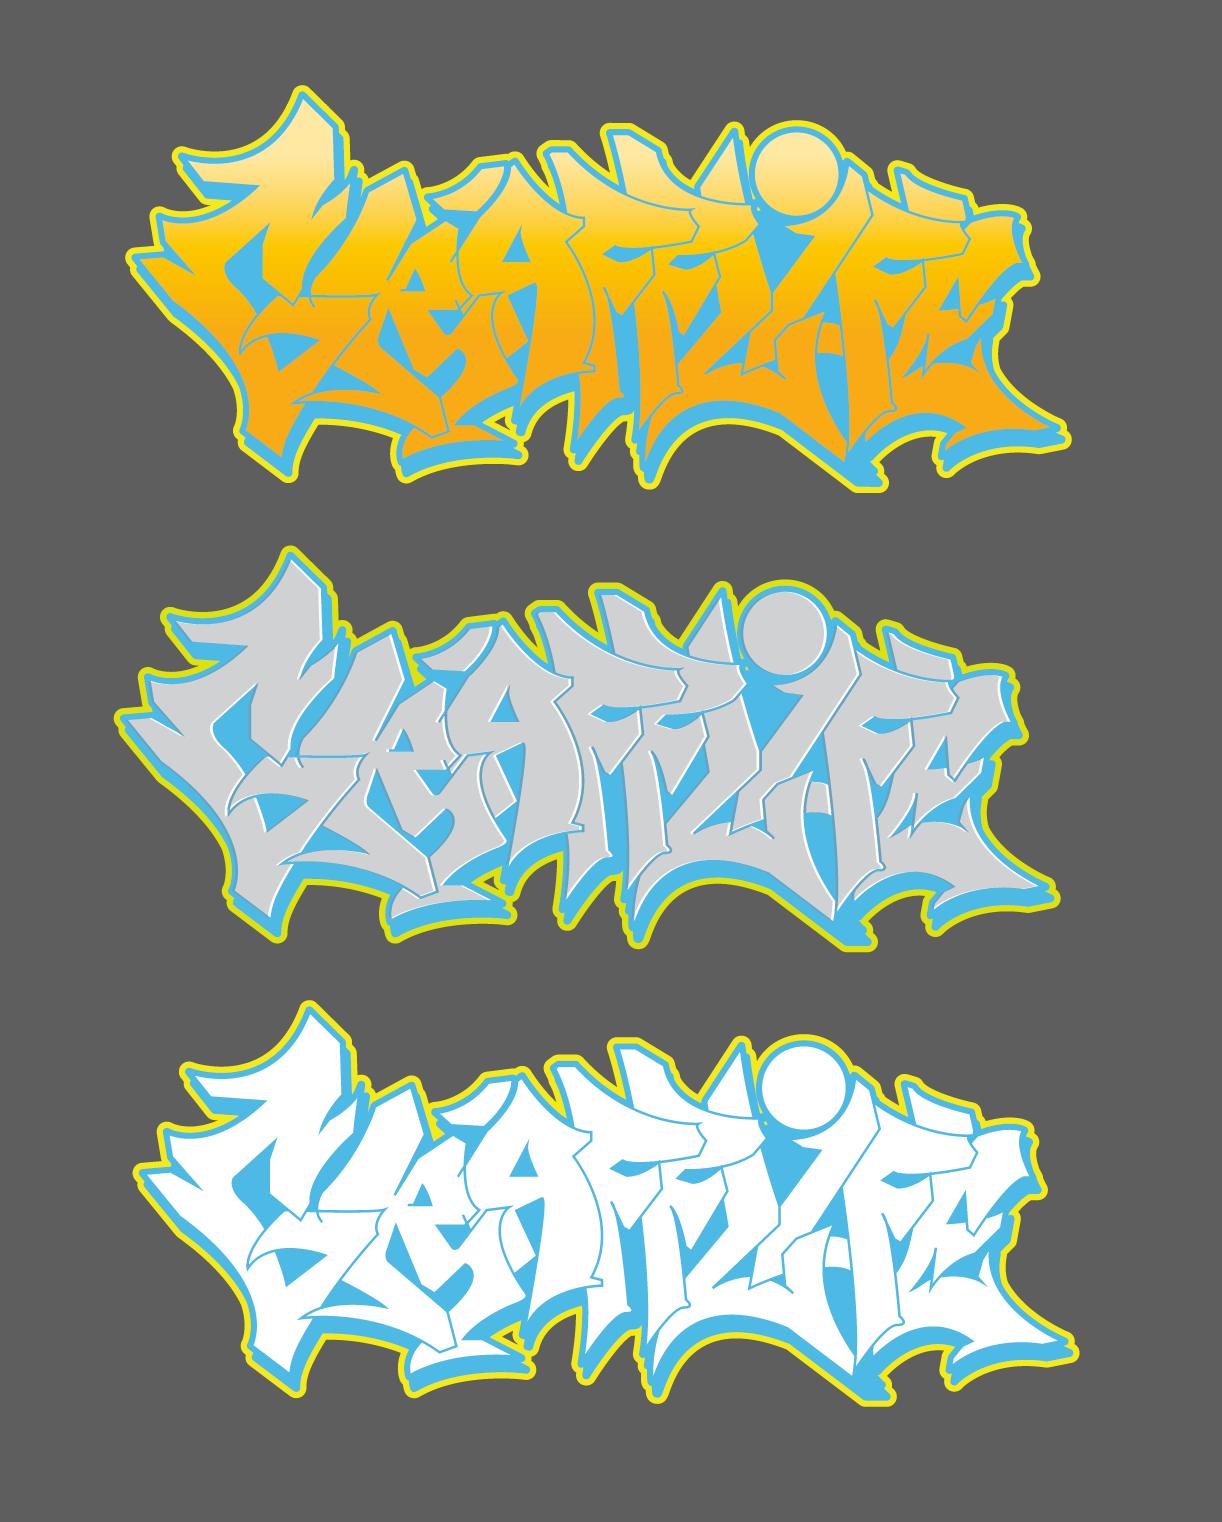 Graffiti is my life